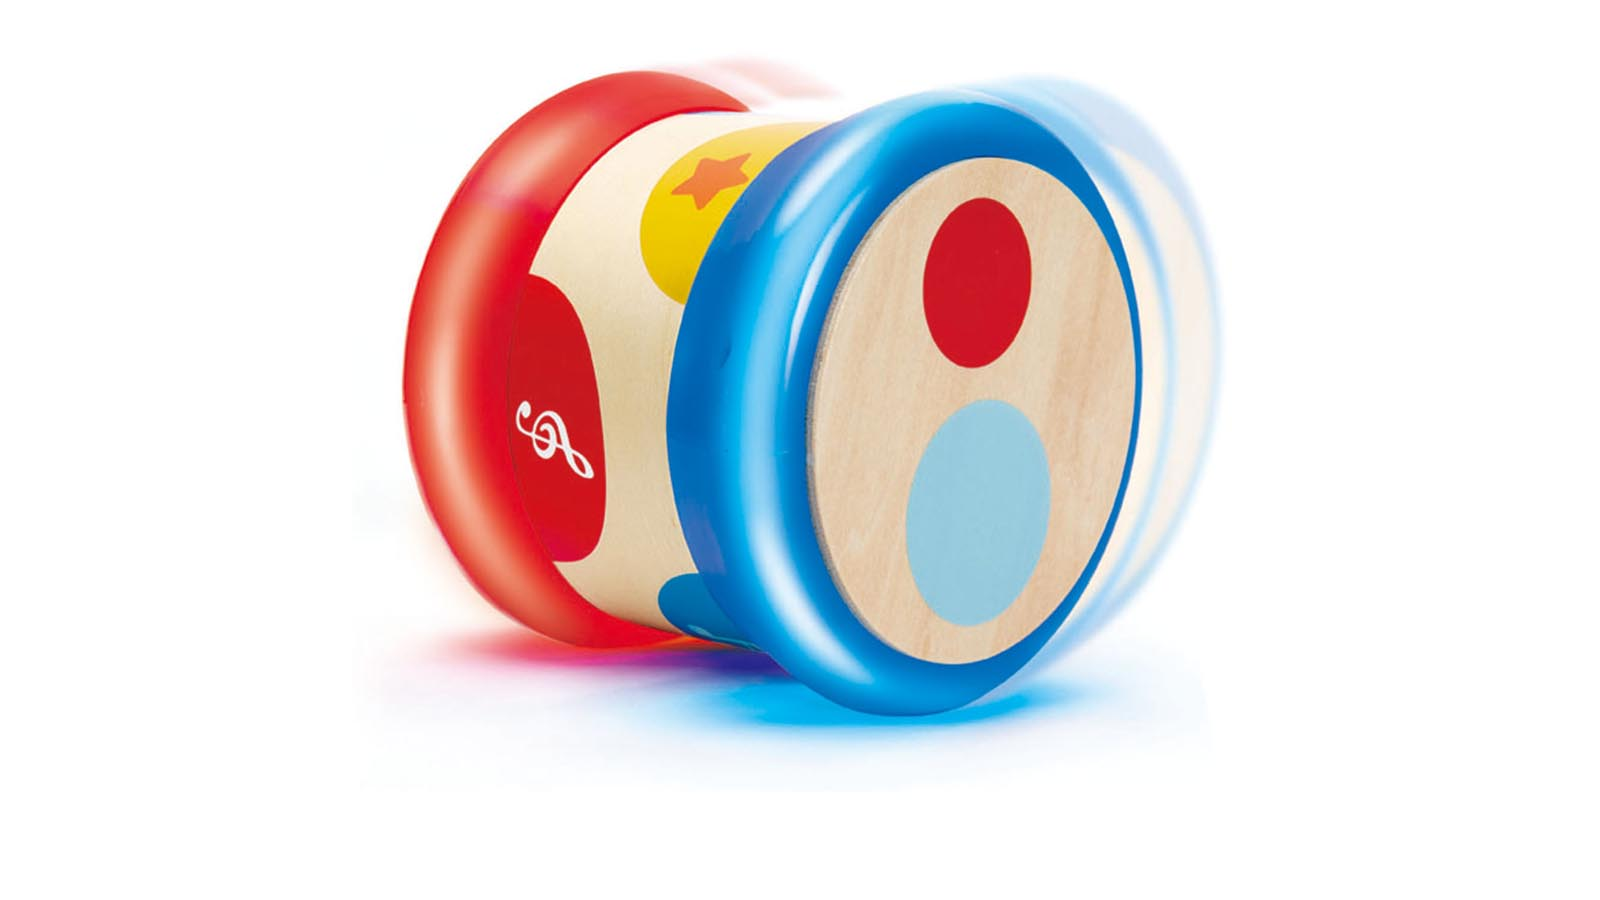 Hape Spielzeug Baby-Trommel